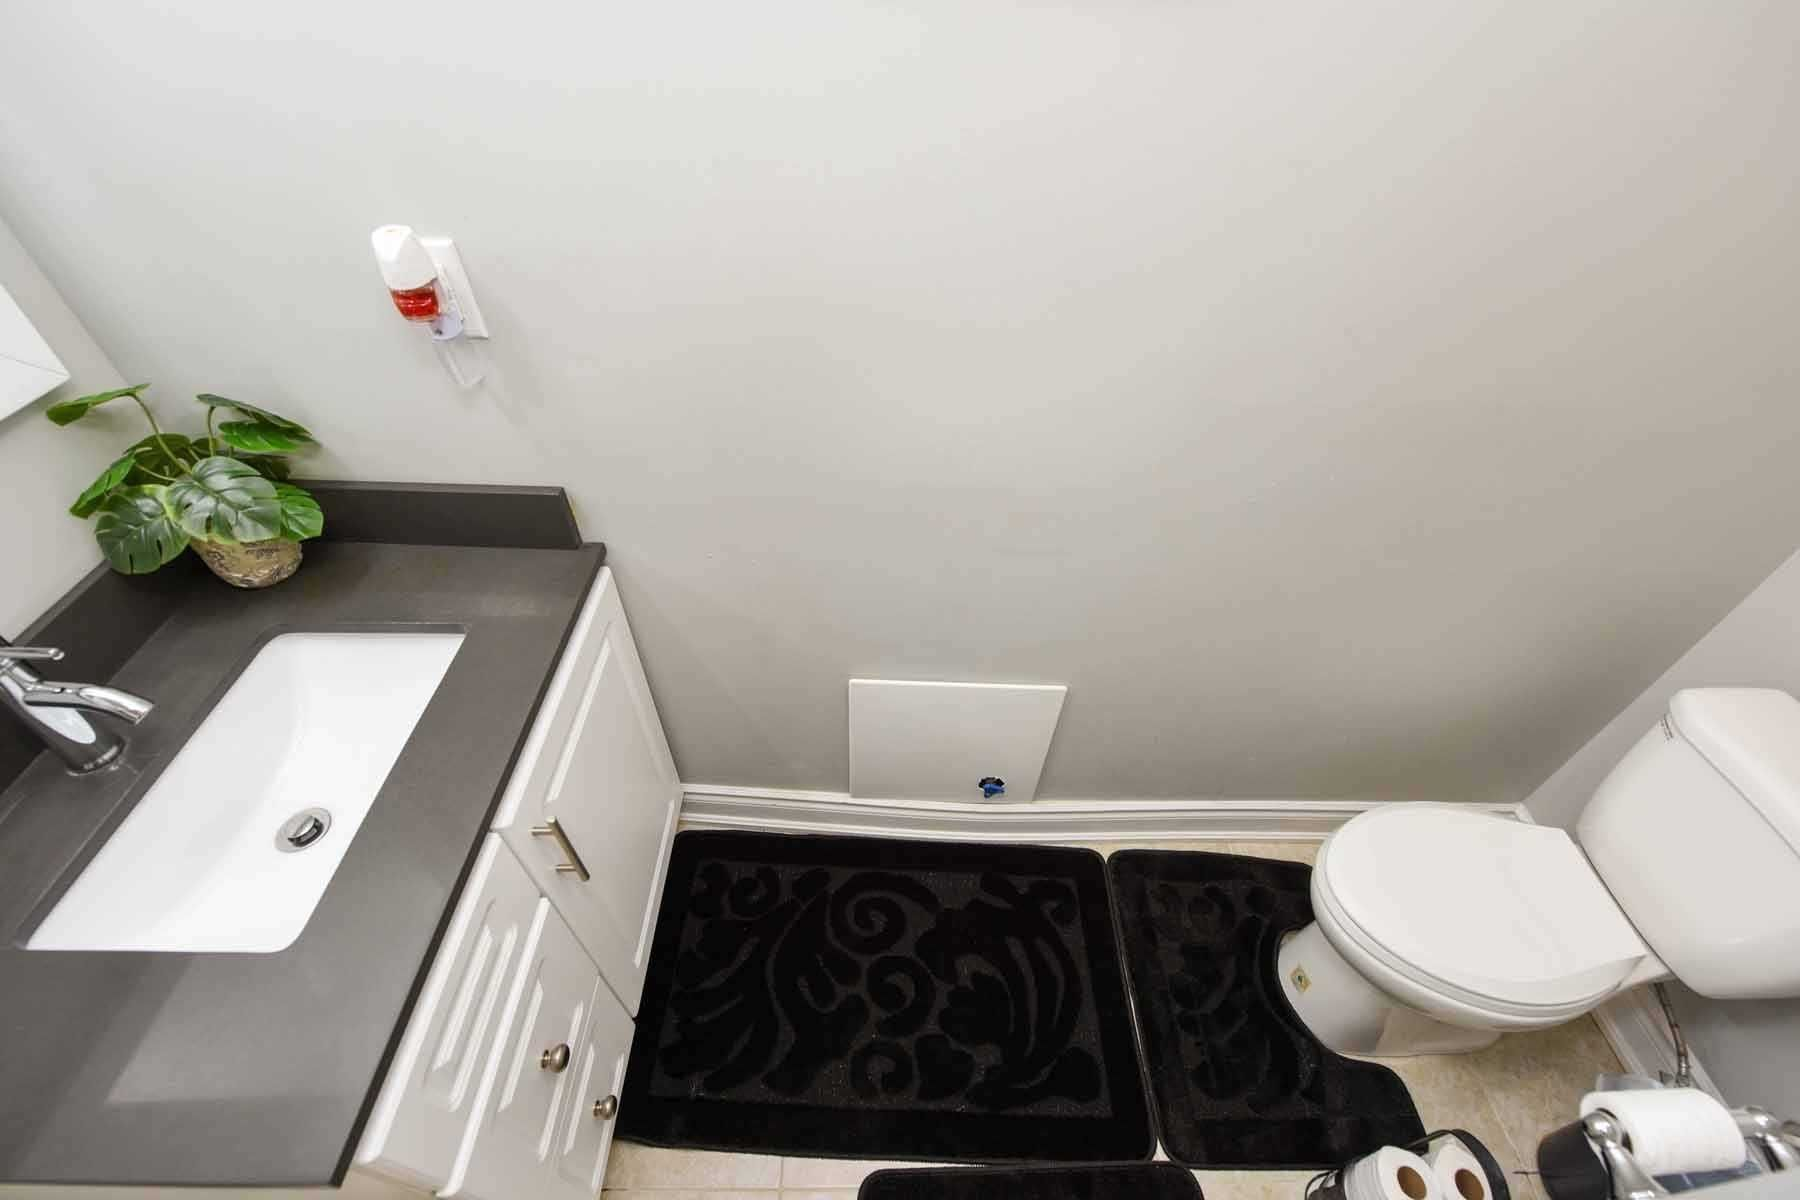 Photo 8: Photos: 20 Hallen Road in Brampton: Fletcher's West House (Apartment) for lease : MLS®# W5074220